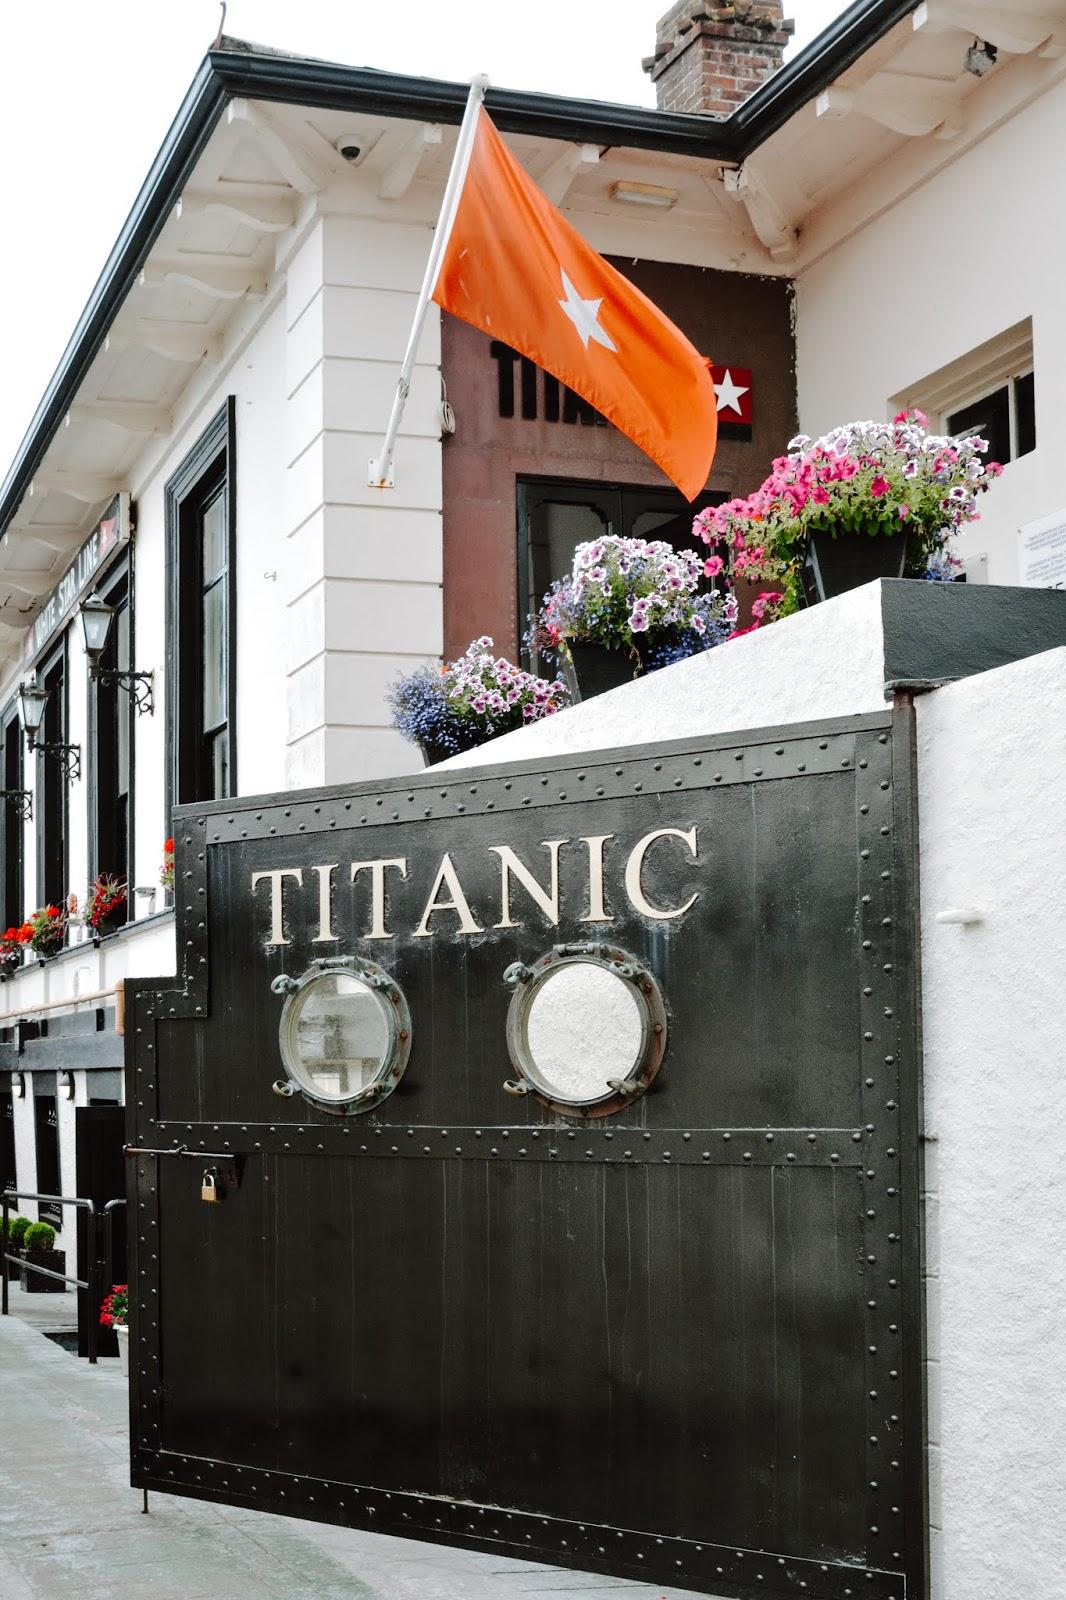 Titanic Cobh Ireland